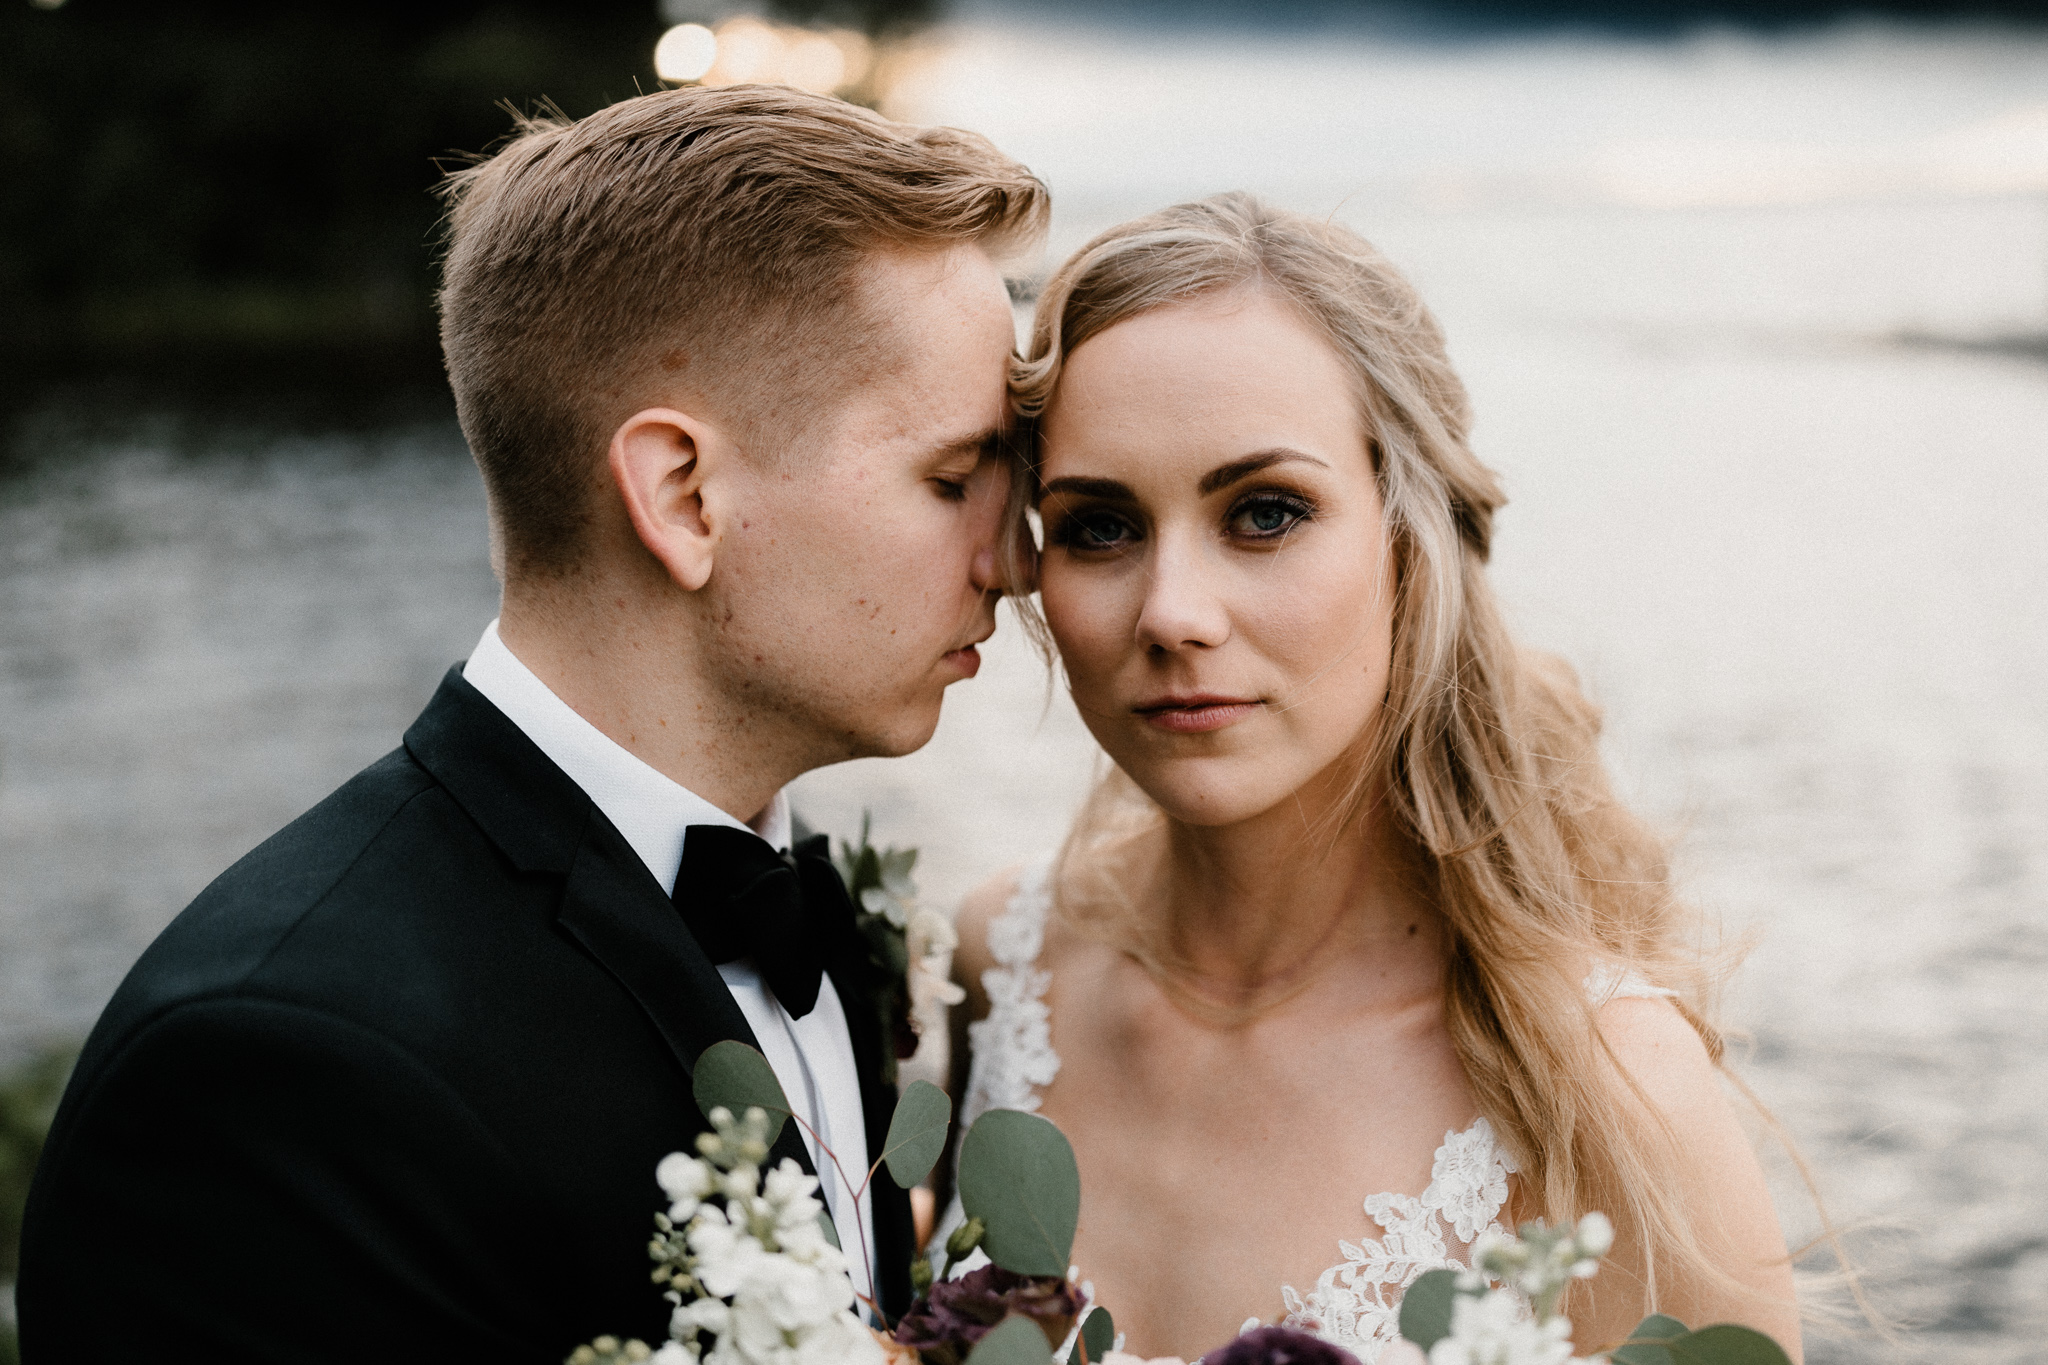 Johanna + Mikko - Tampere - Photo by Patrick Karkkolainen Wedding Photographer-128.jpg